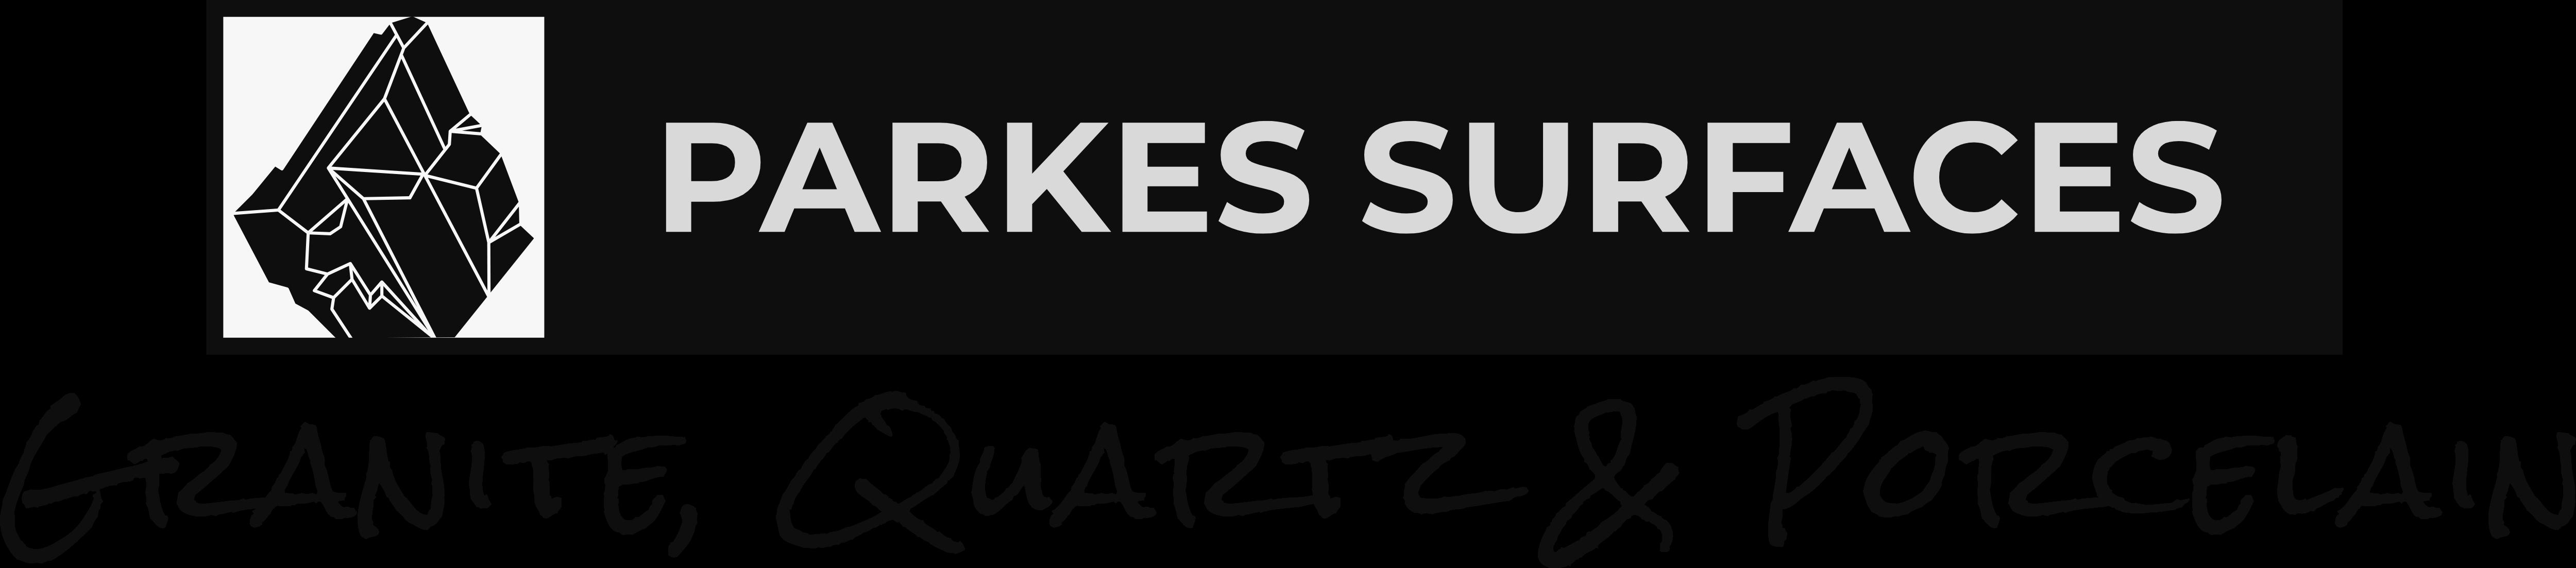 parkessurfaces.com